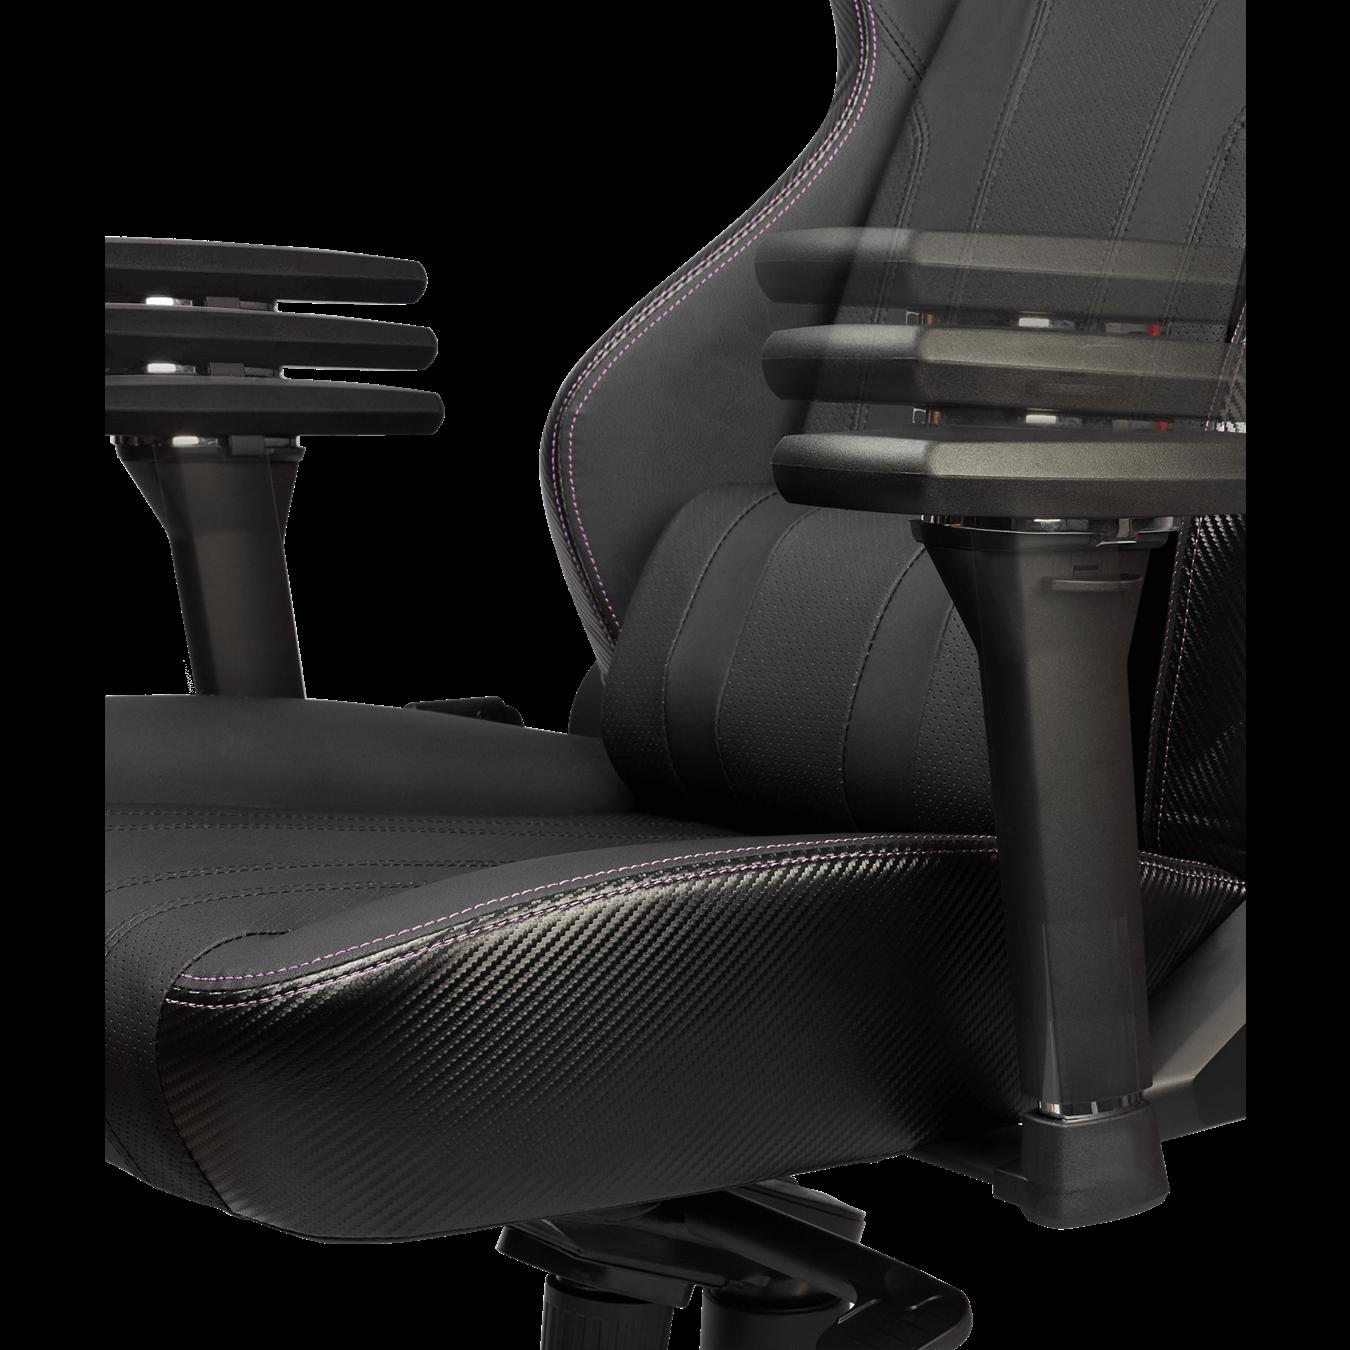 Caliber X1 Armrest Up/Down